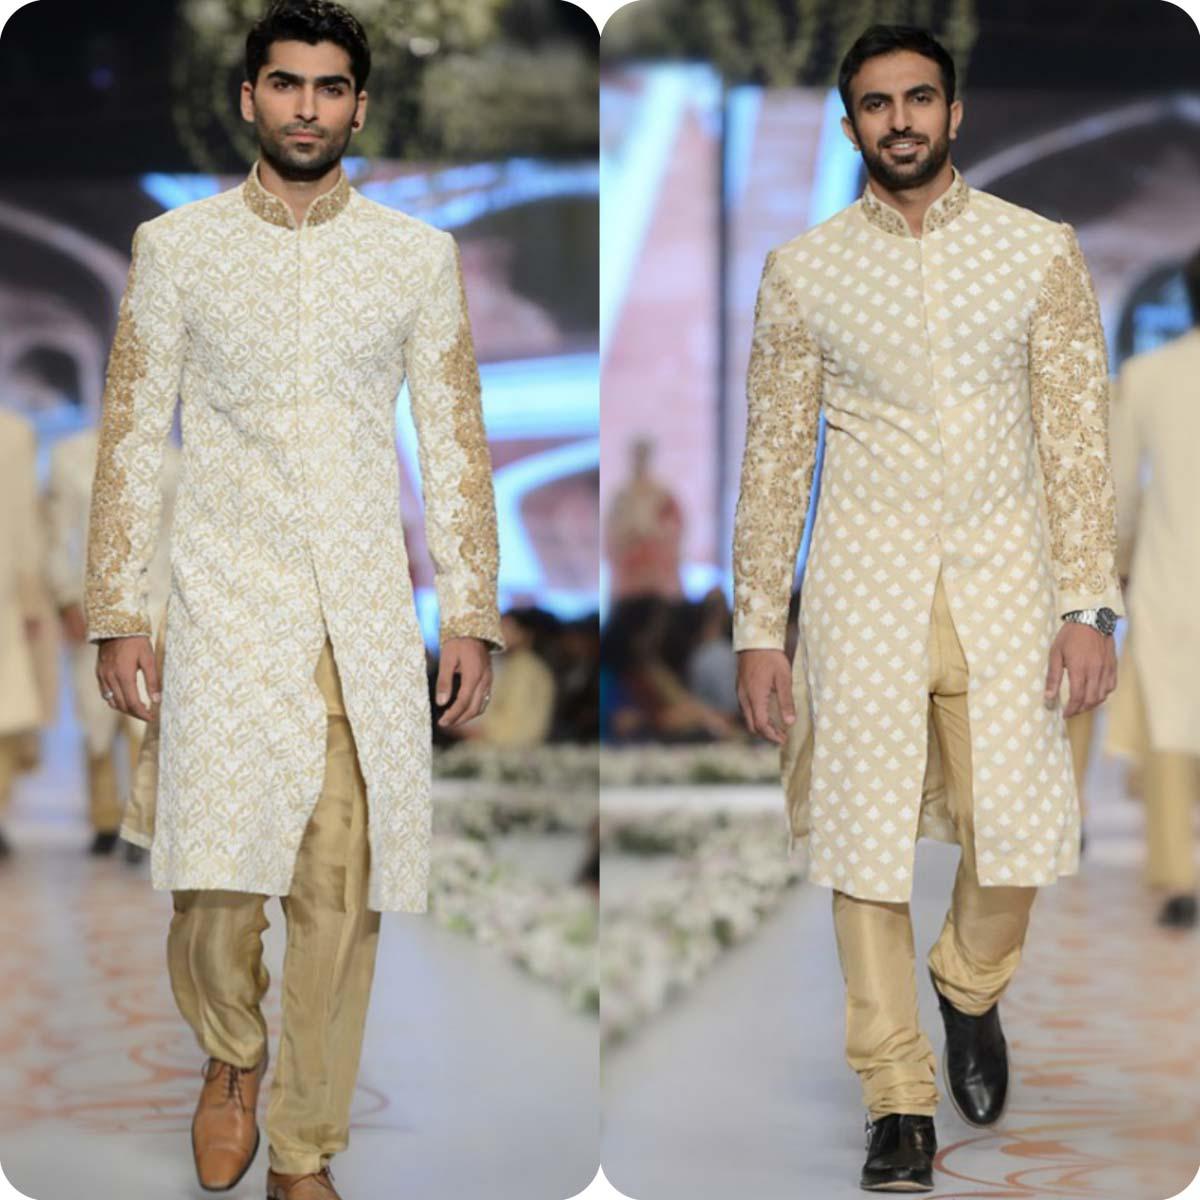 hsyhassan-sheryar-yaseen-wedding-dresses-for-men-2016-3